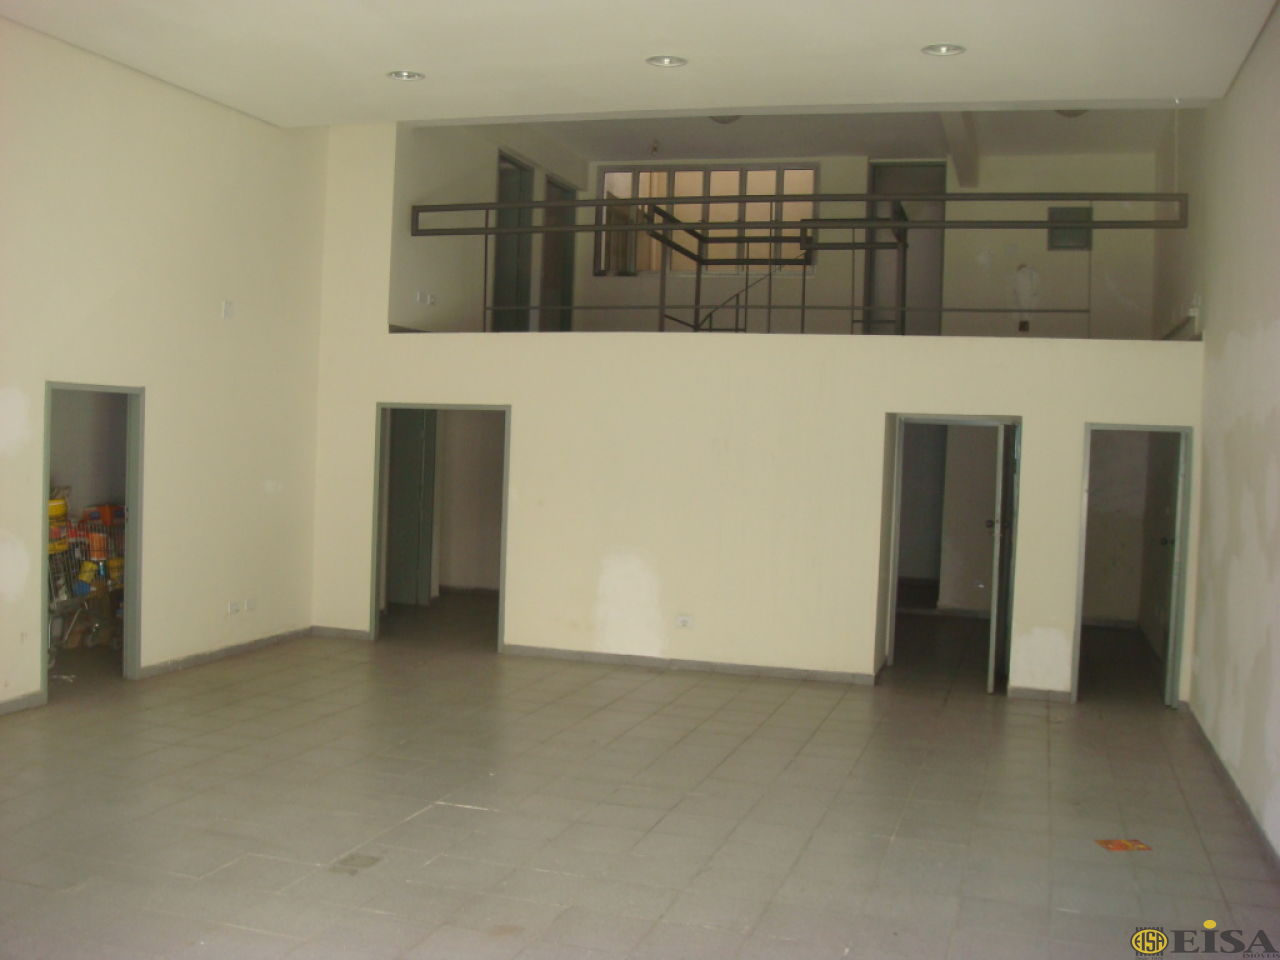 VENDA | COMERCIAL - Jardim Brasil Zona Norte - 2 dormitórios -  Vagas - 283m² - CÓD:EJ4793